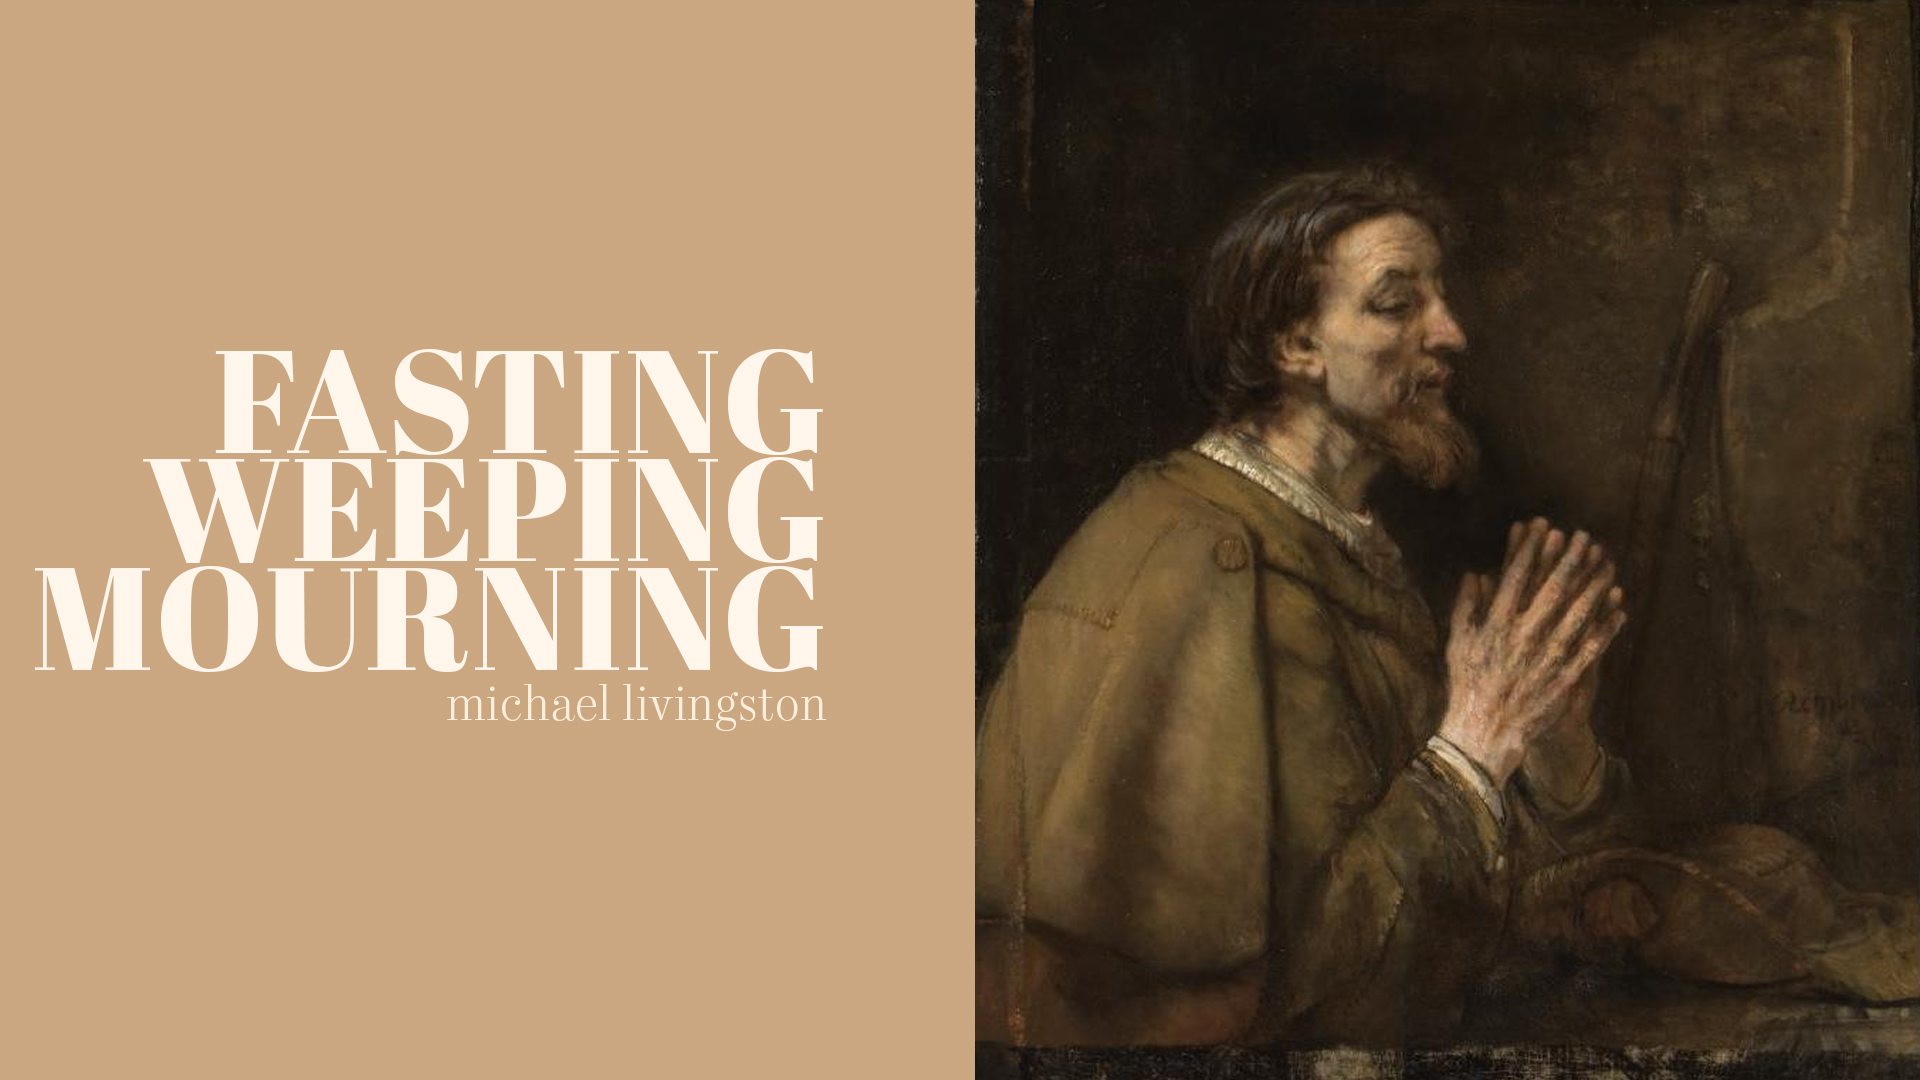 fastingweepingmourning.jpg